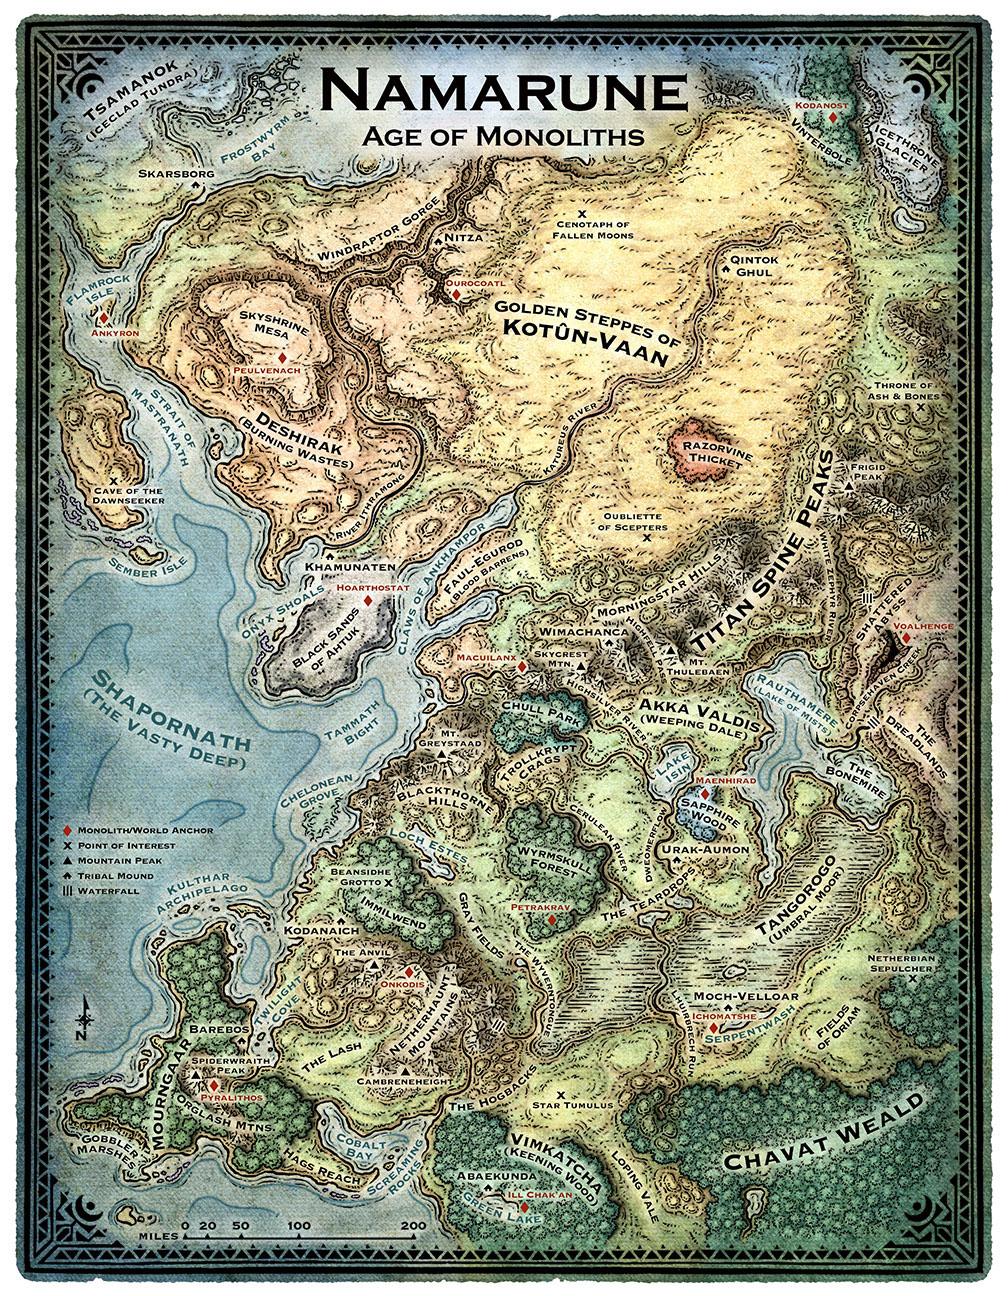 Map of Namarun